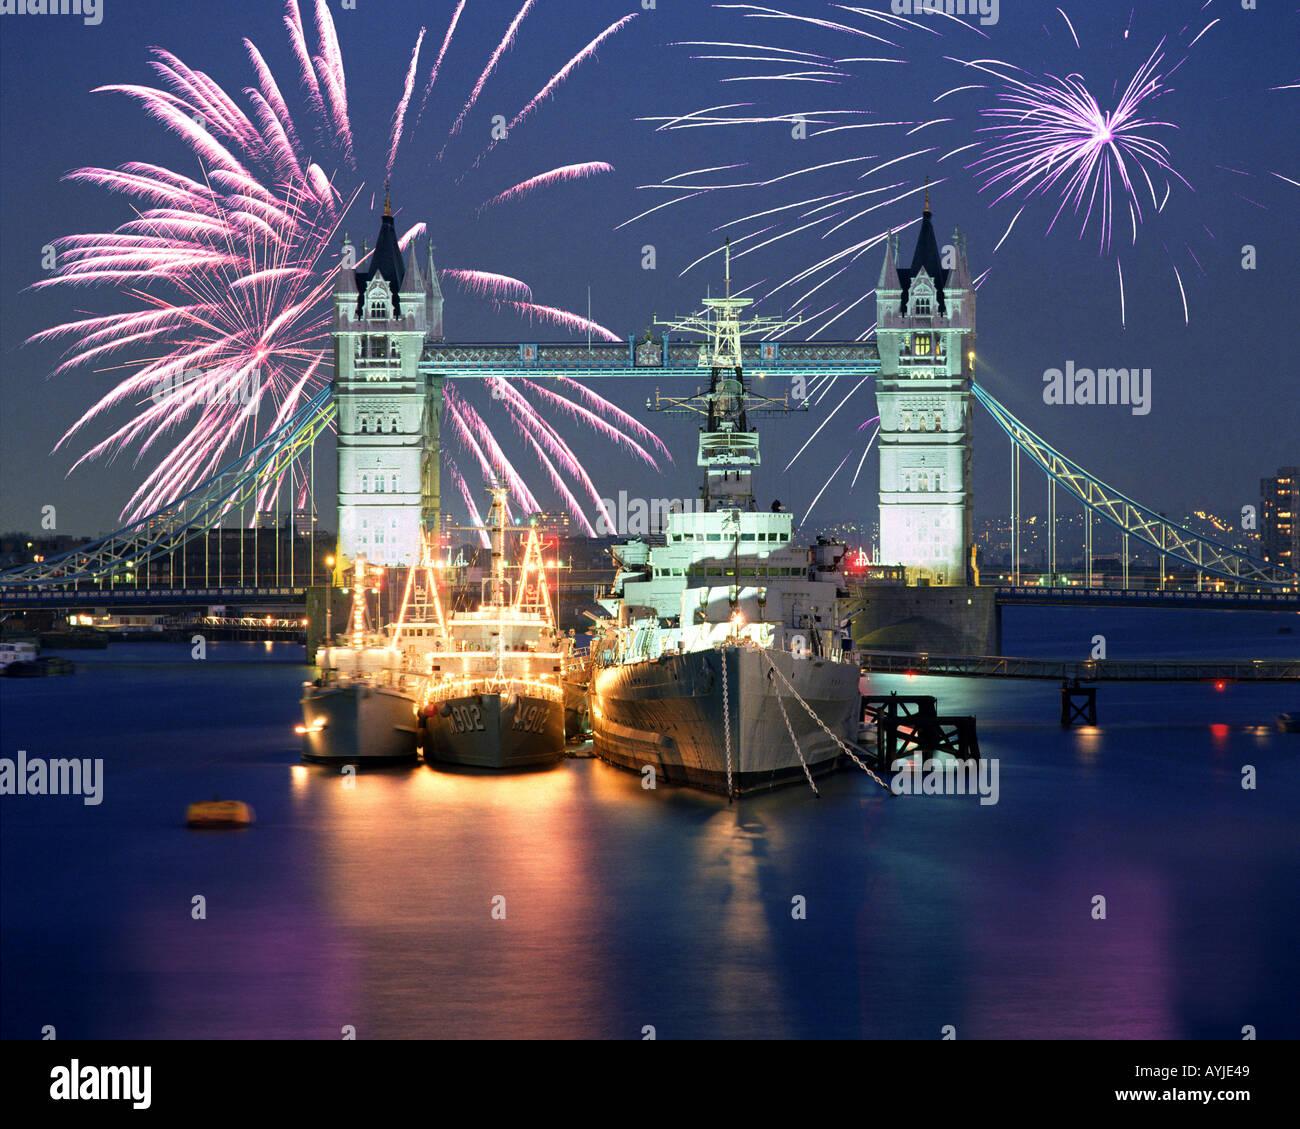 GB - LONDON: Tower Bridge and HMS Belfast - Stock Image